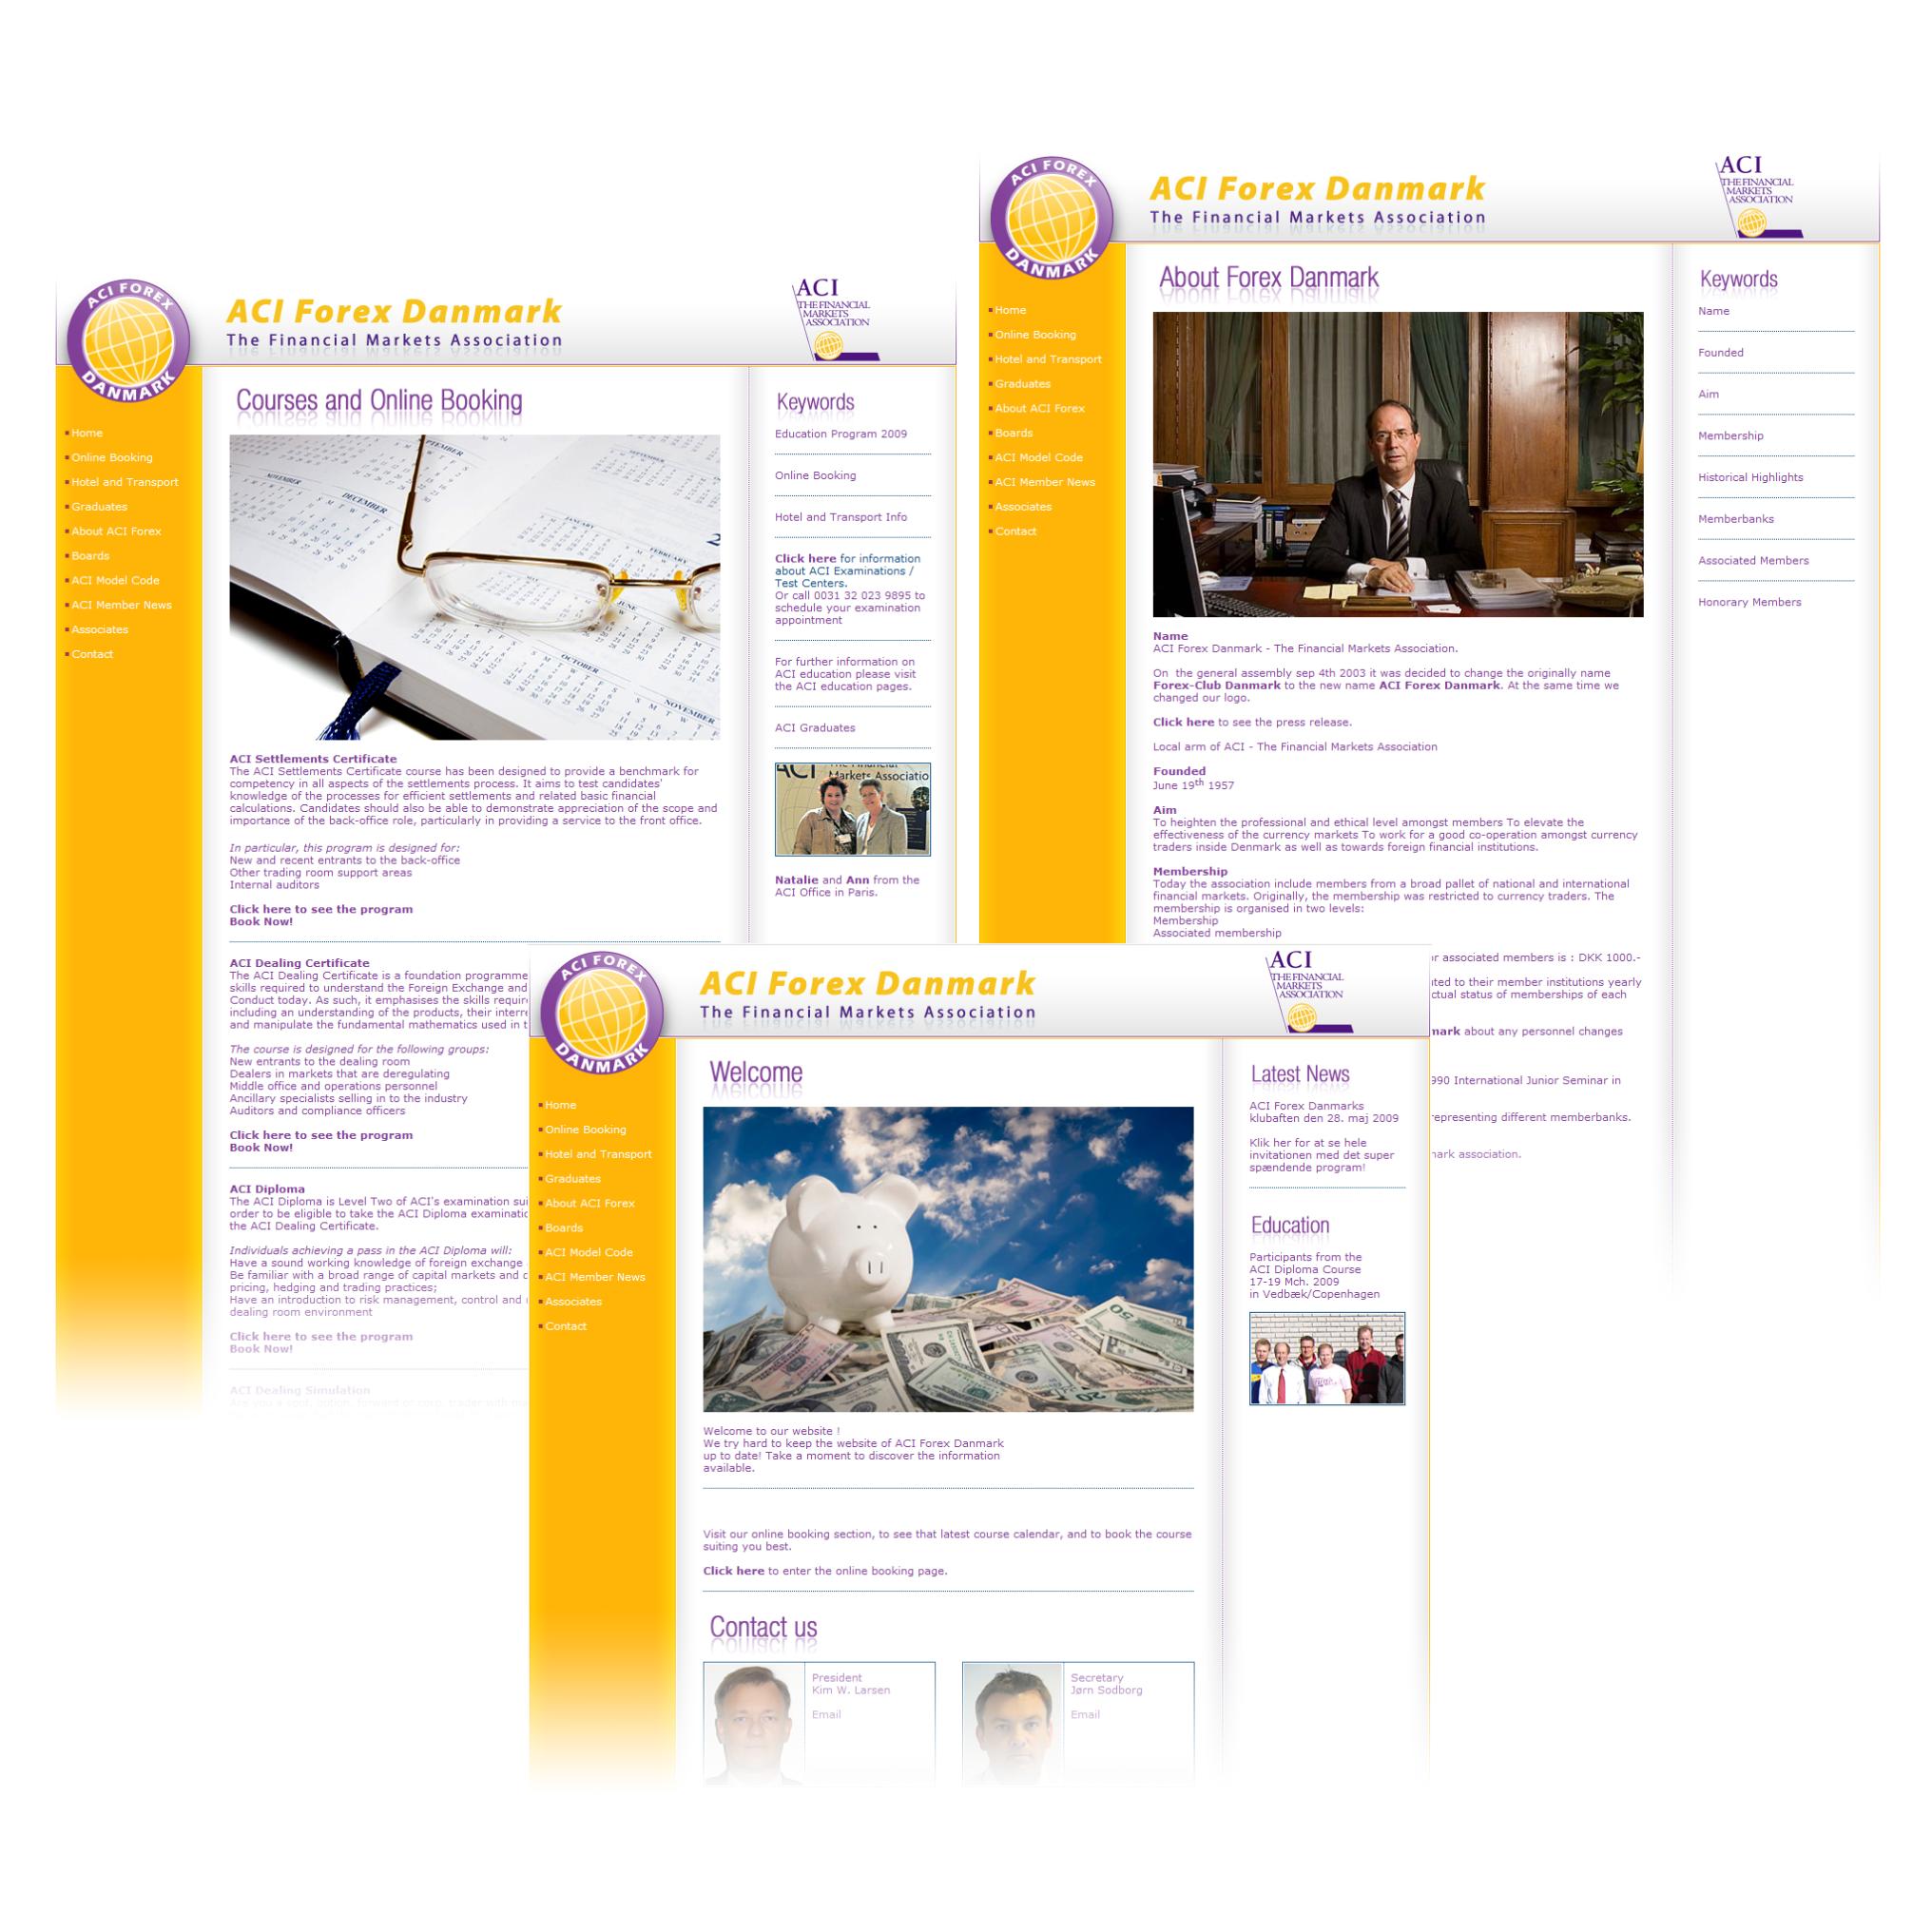 Web Design Digital Design Websites HTML5 CSS3 Campaign Websites JQuery